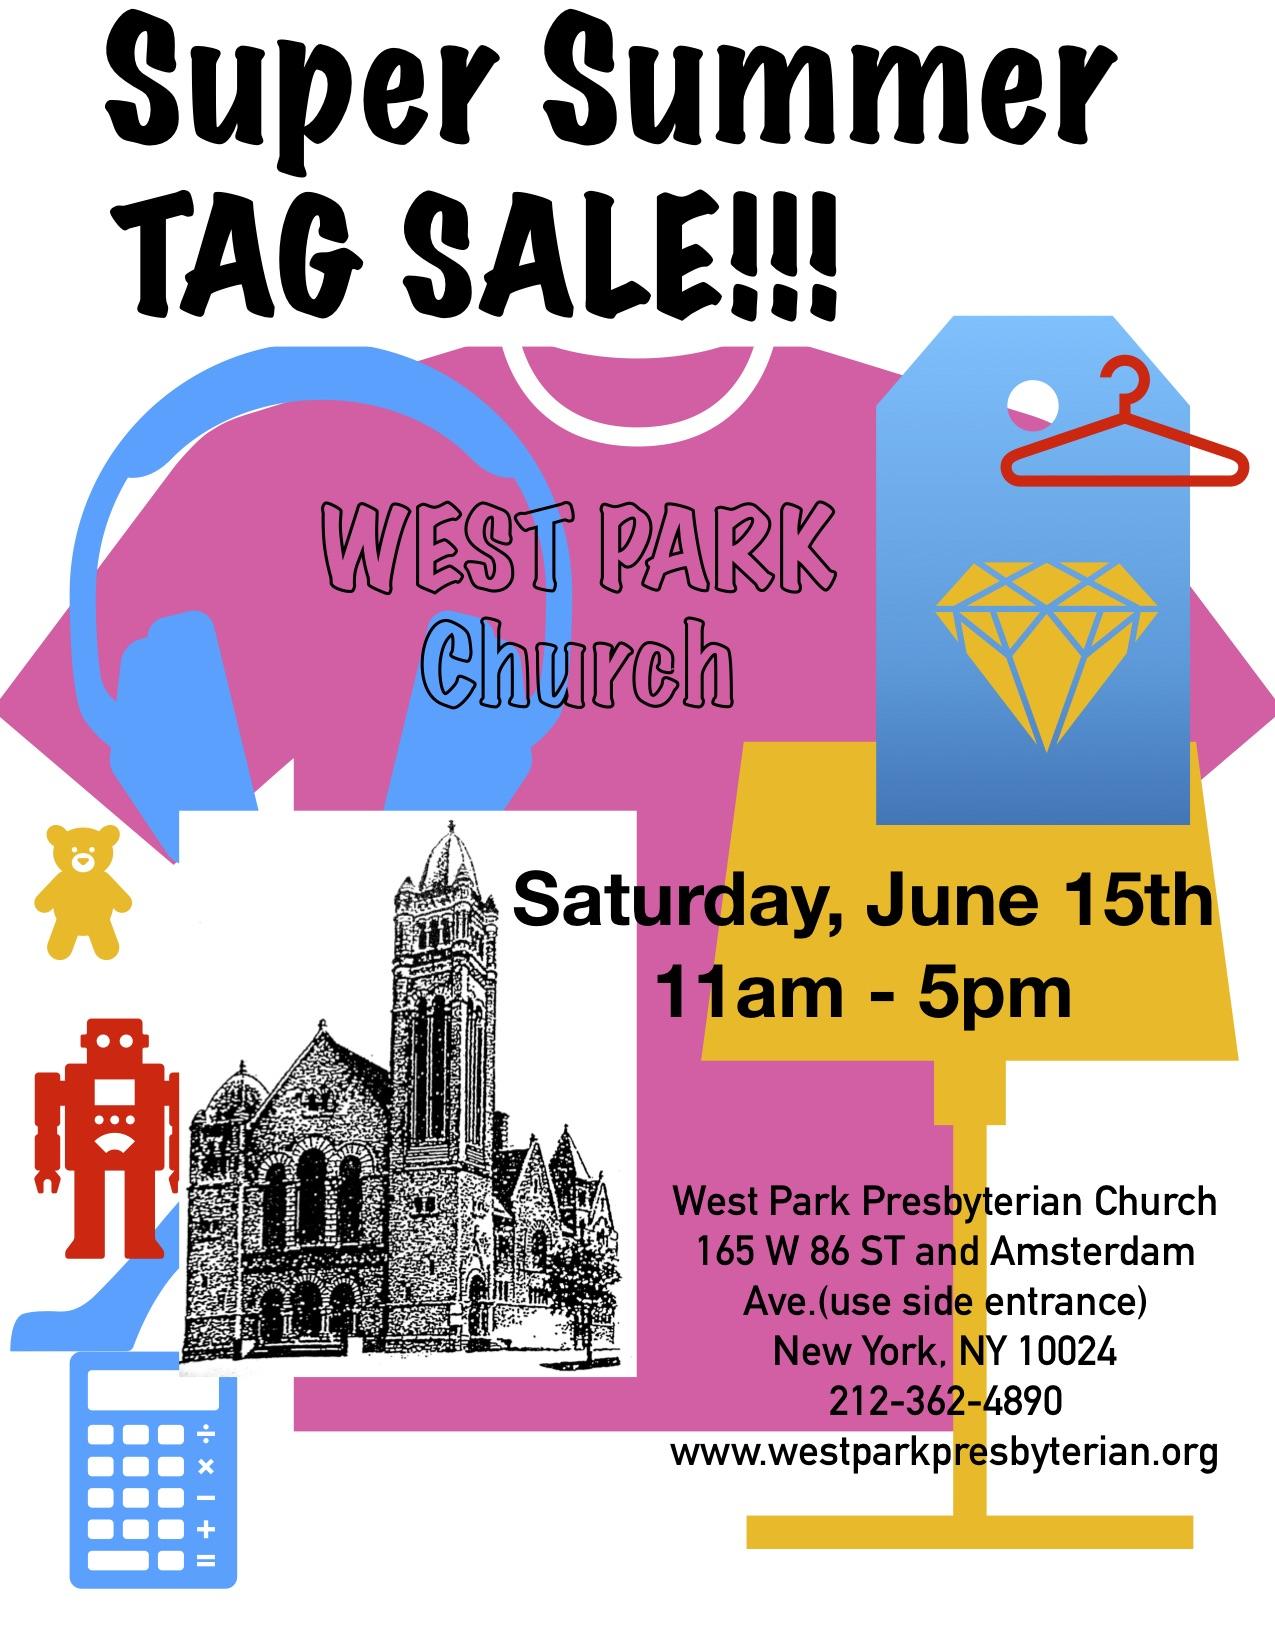 West Park Super Summer Tag Sale!!! Saturday, June 15th 11am